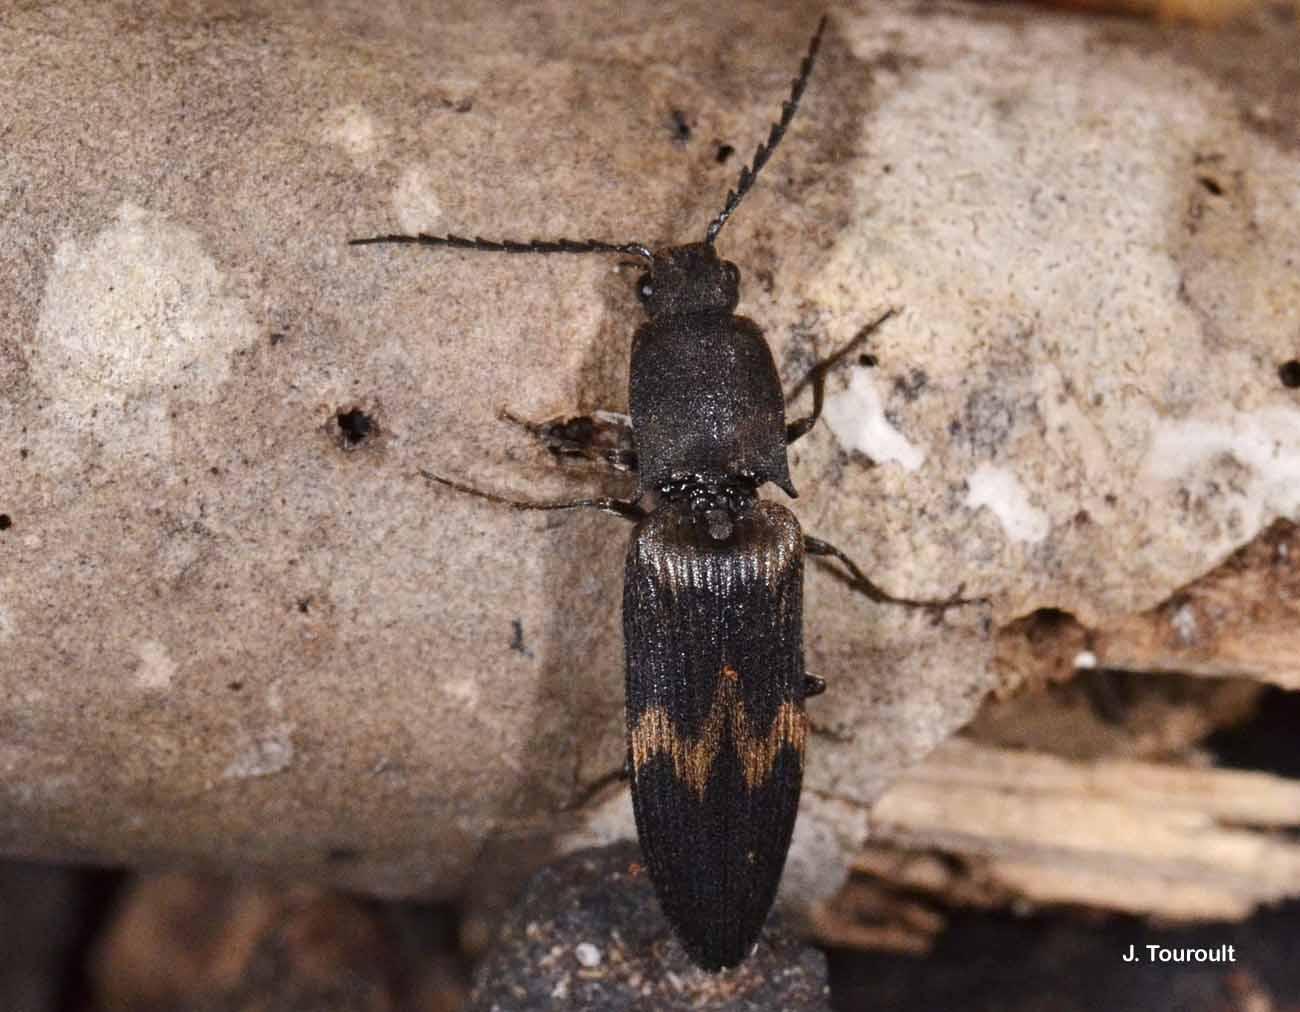 Diacanthous undulatus